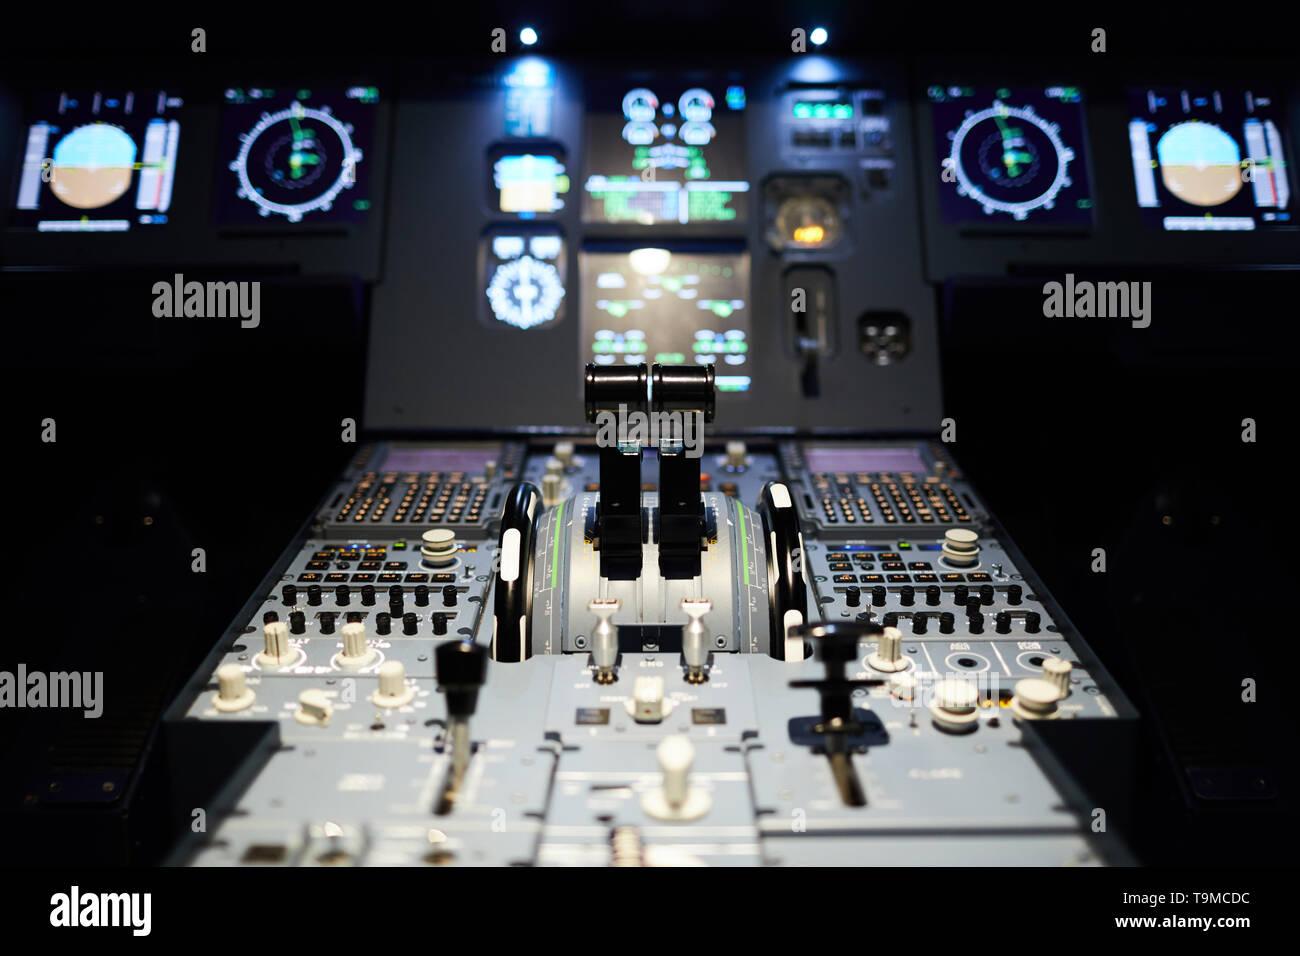 Airplane cockpit with illumination - Stock Image